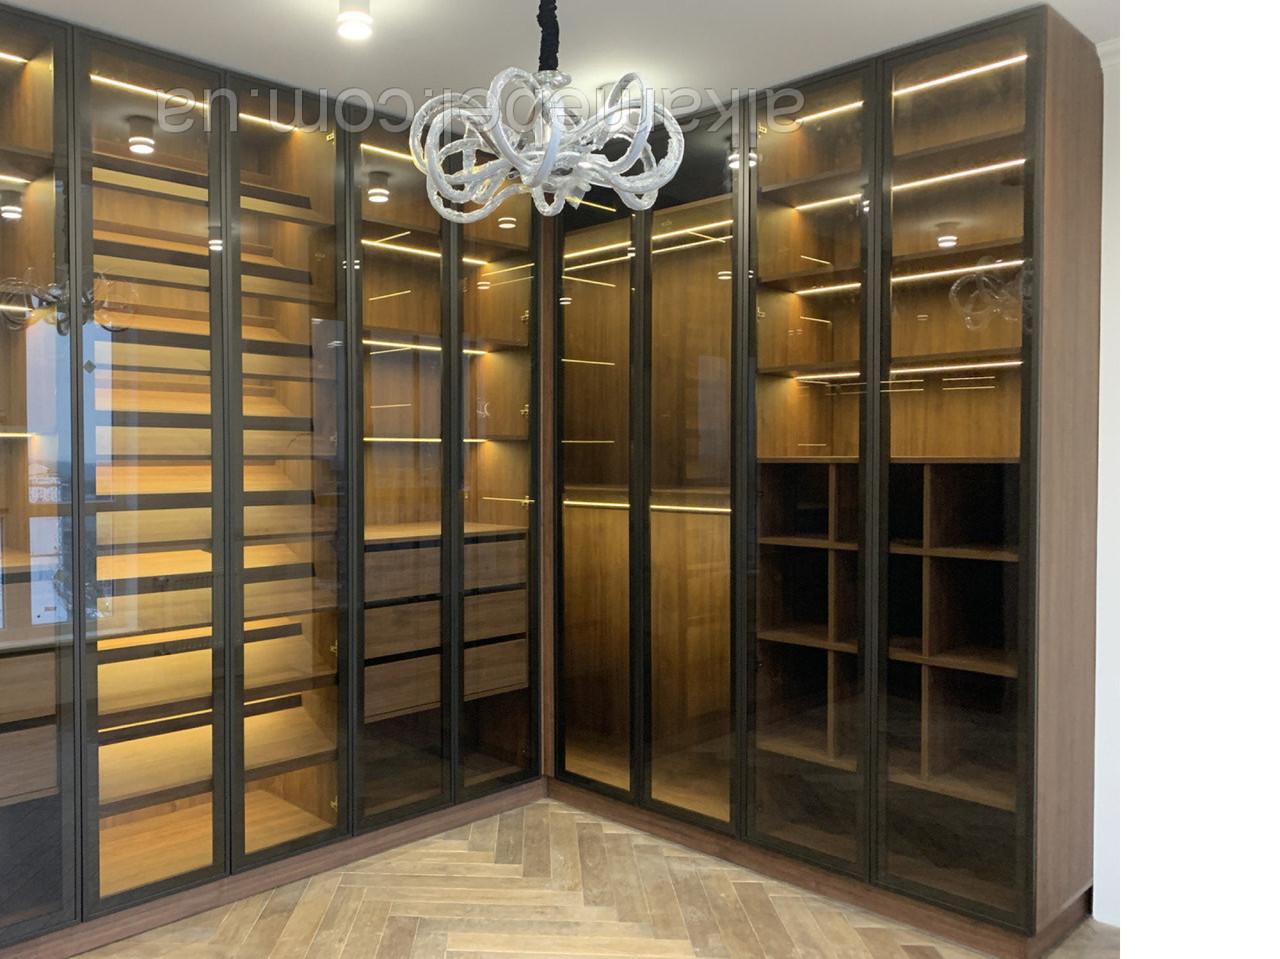 ae8209144b865 New 2019 Гардеробная комната на заказ V303 - Шкафы купе «Алька Мебель» в  Киеве